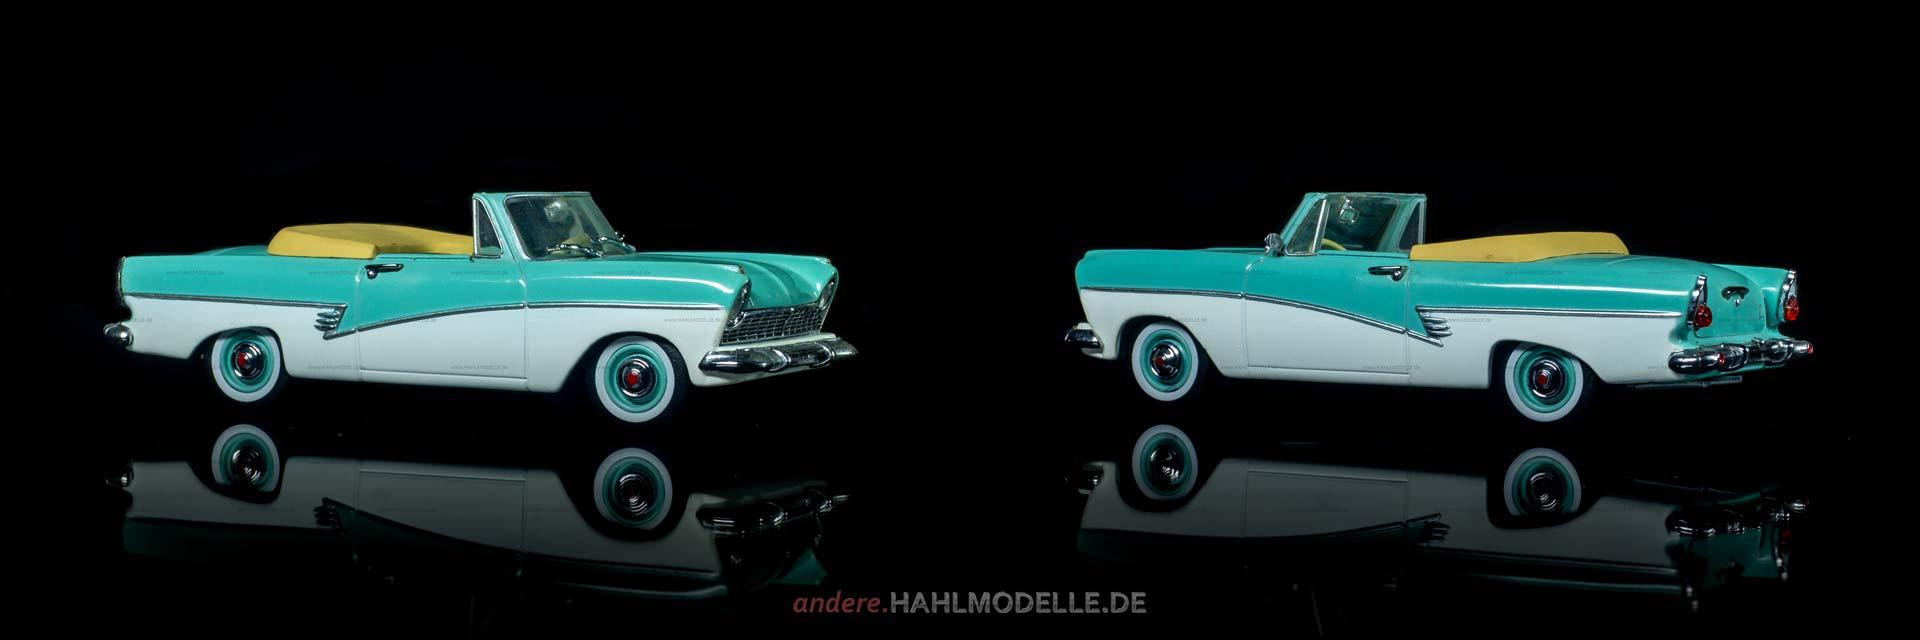 Ford Taunus 17M (P2) | Cabriolet | Revell | 1:43 | www.andere.hahlmodelle.de